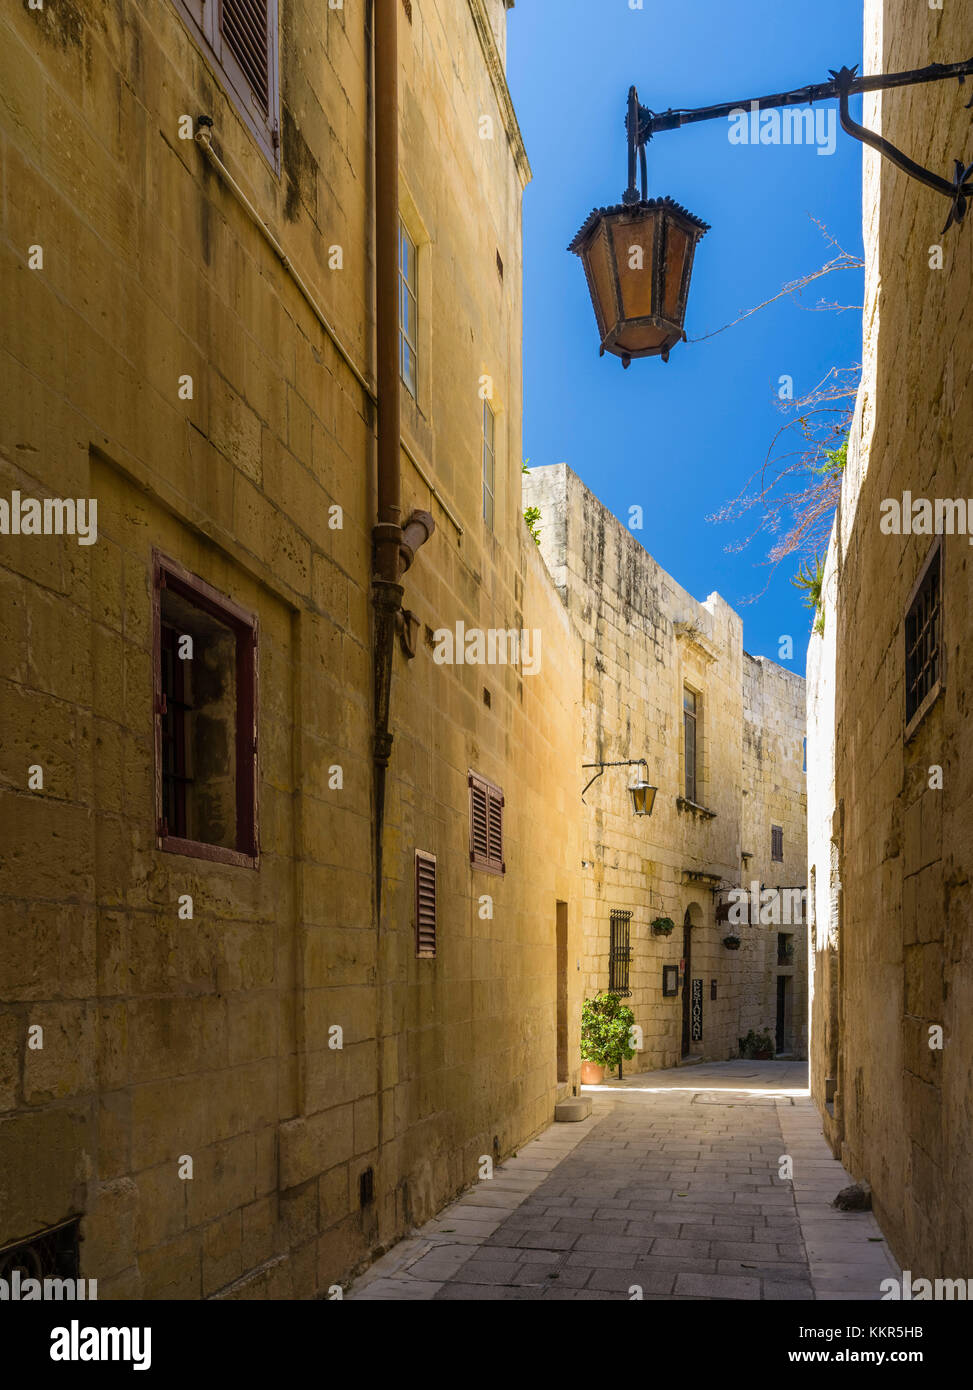 Lane en el pintoresco casco antiguo de la capital de Malta, Mdina Imagen De Stock